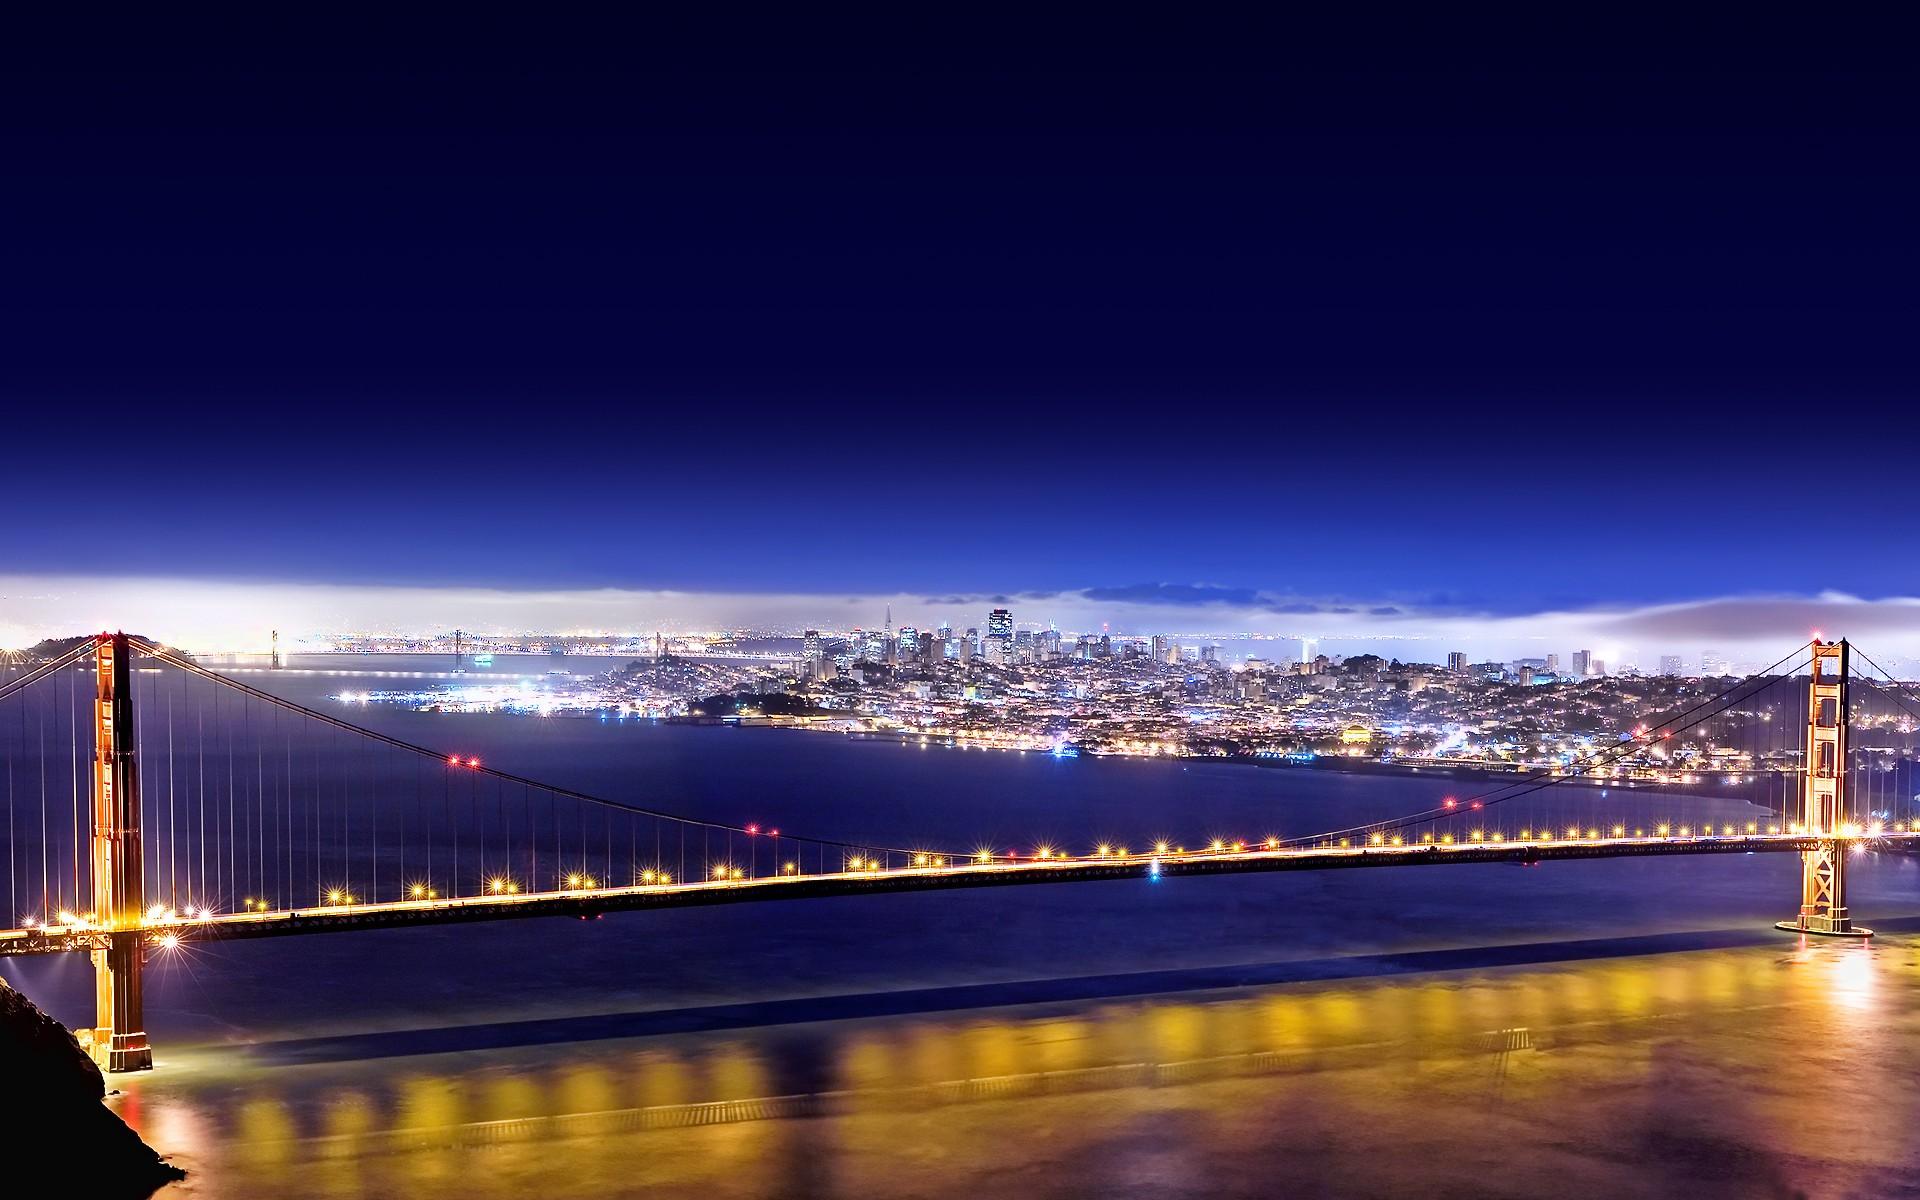 Great Wallpaper Night Golden Gate Bridge - lights-cityscape-night-reflection-skyline-skyscraper-evening-bridge-San-Francisco-horizon-panorama-Golden-Gate-Bridge-dusk-light-dawn-landmark-254423  Perfect Image Reference-93917.jpg